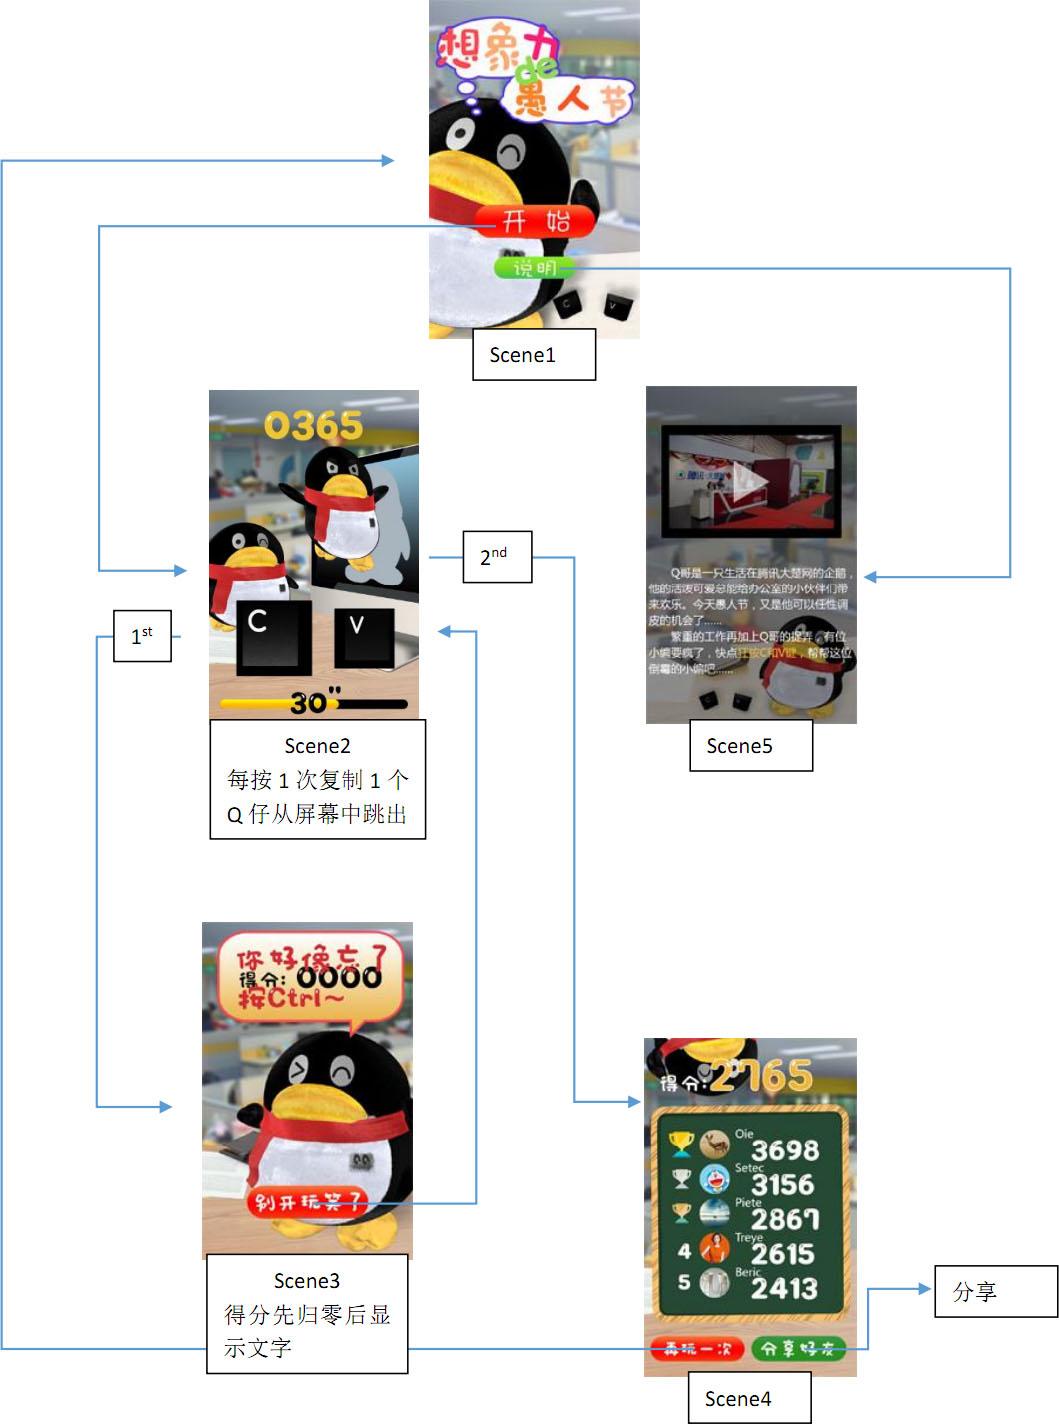 Q仔的愚人节小游戏-交互流程图